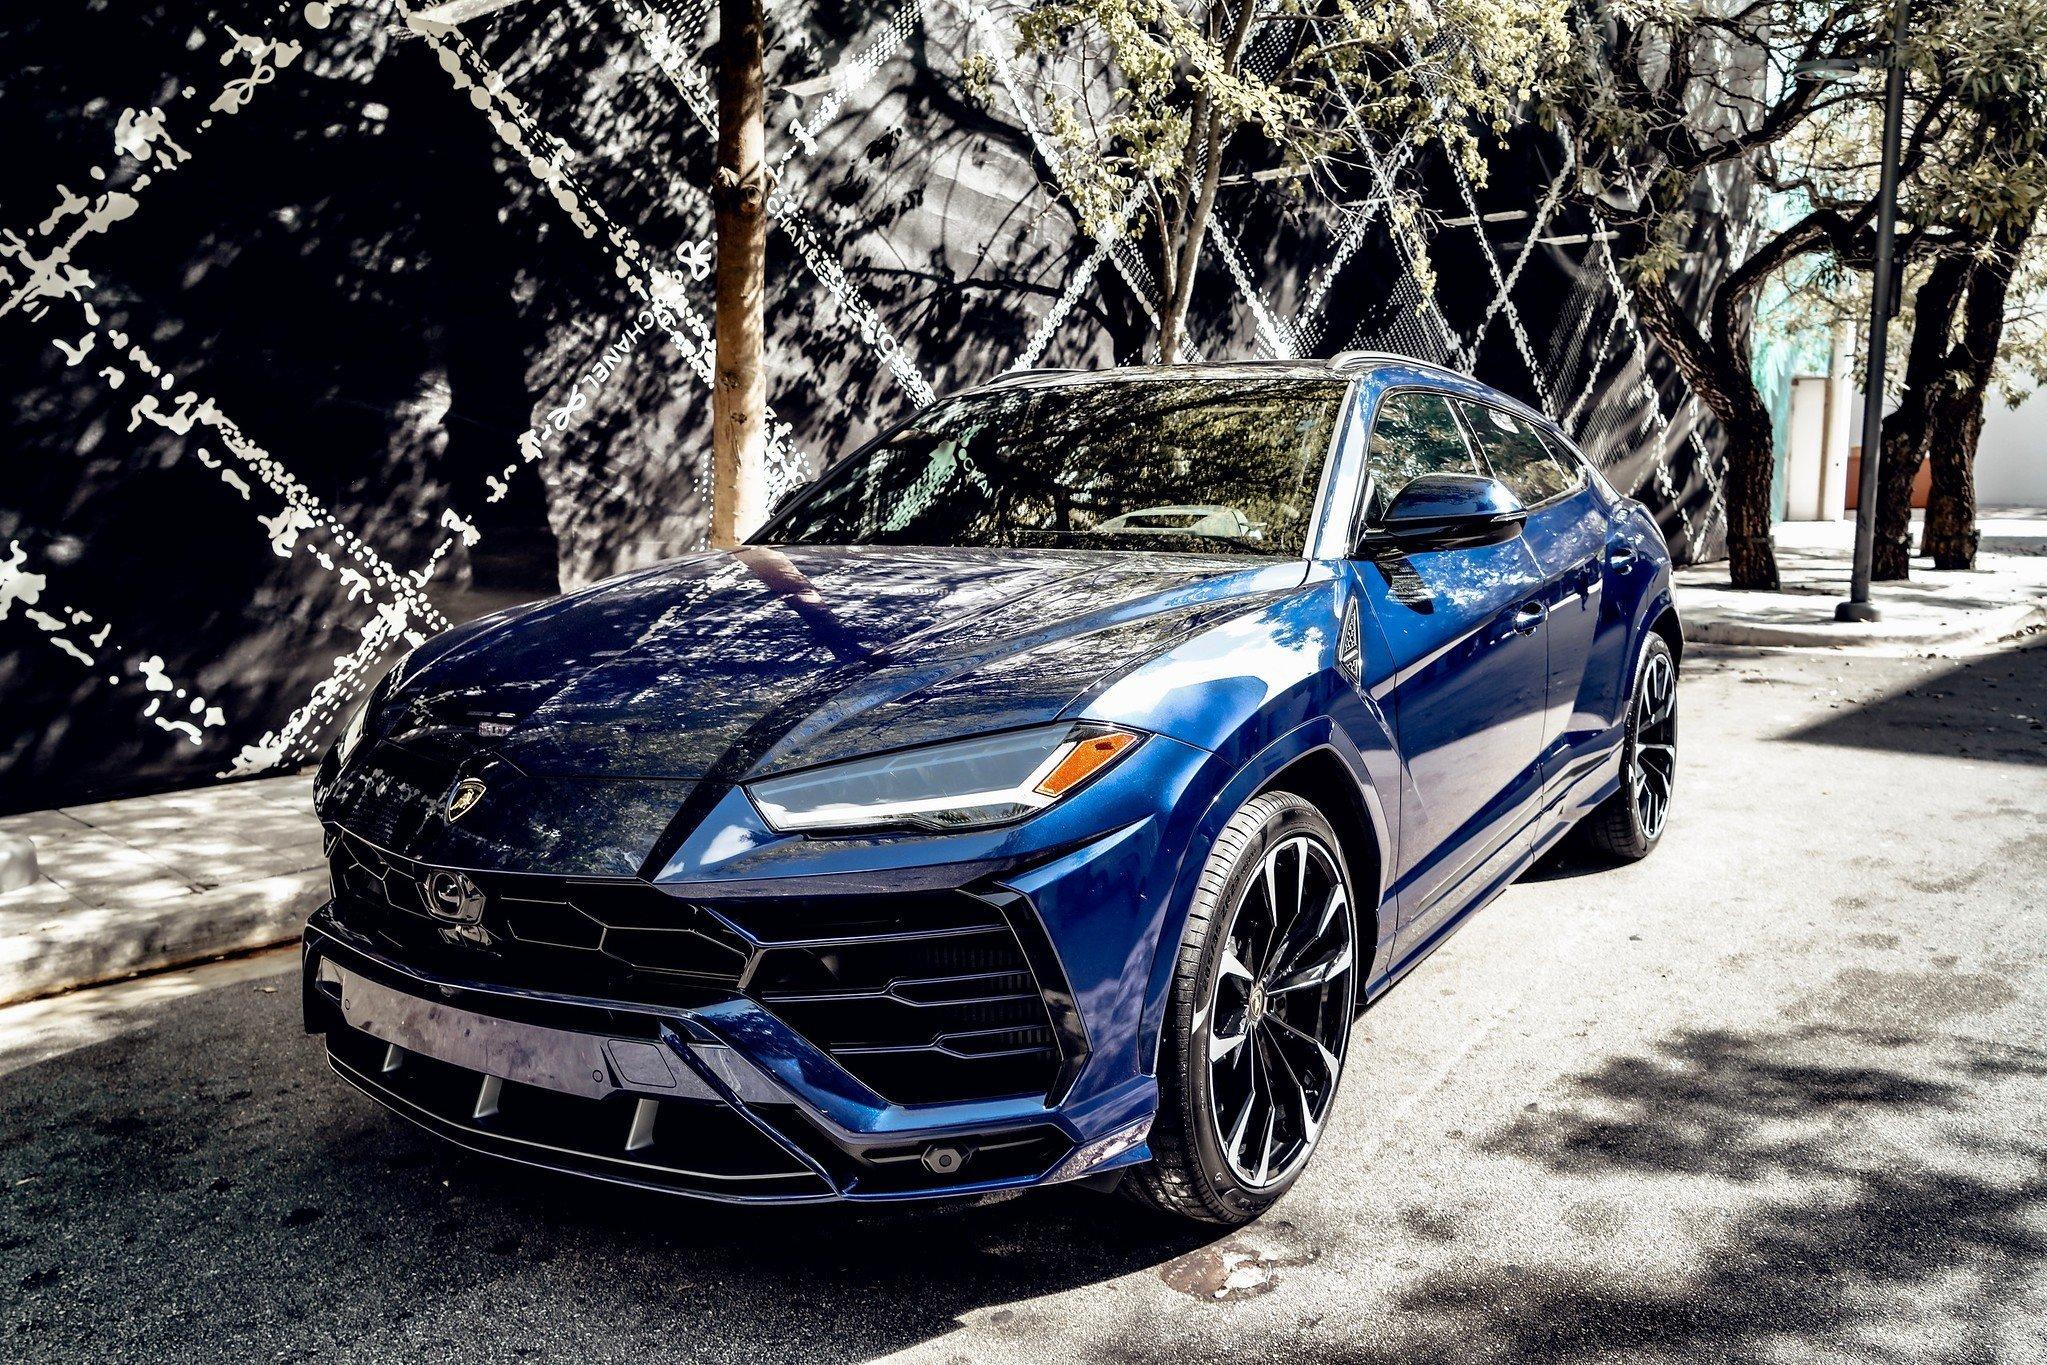 Image #4 of our  2021 Lamborghini Urus - Dark Blue    In Miami Fort Lauderdale Palm Beach South Florida